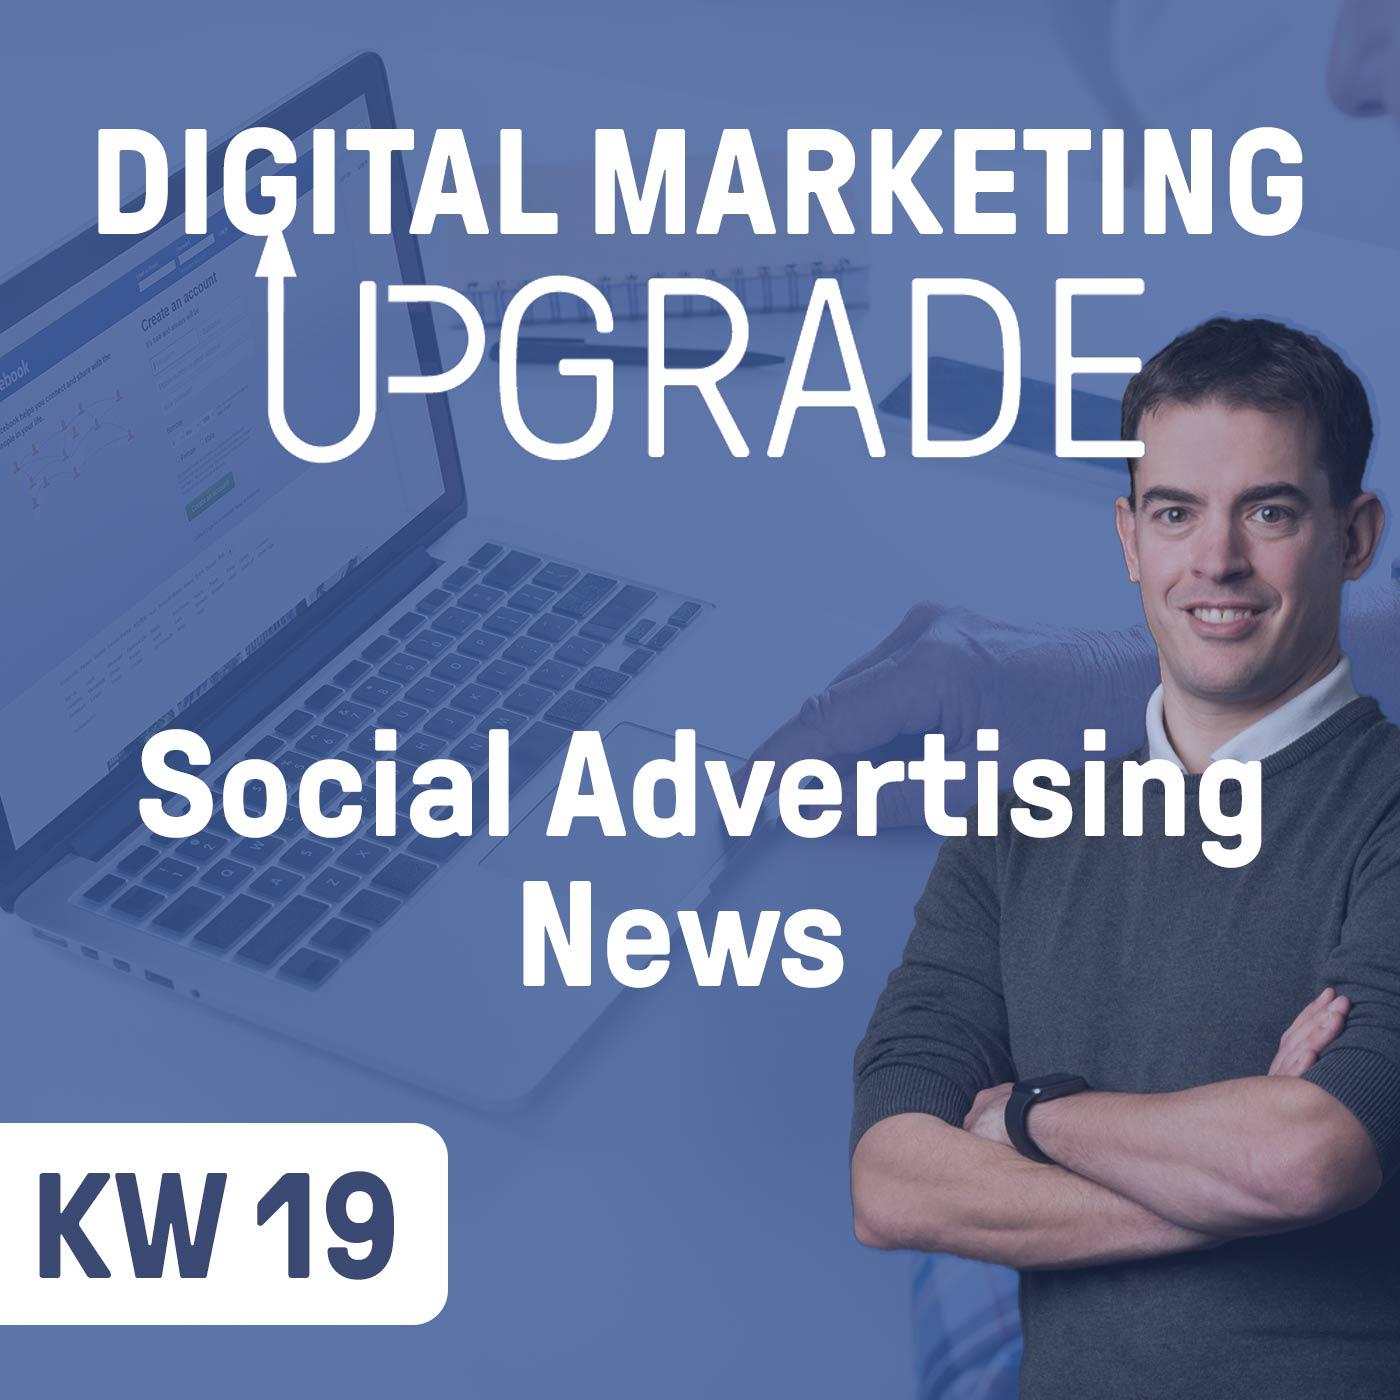 Social Advertising News - KW 19